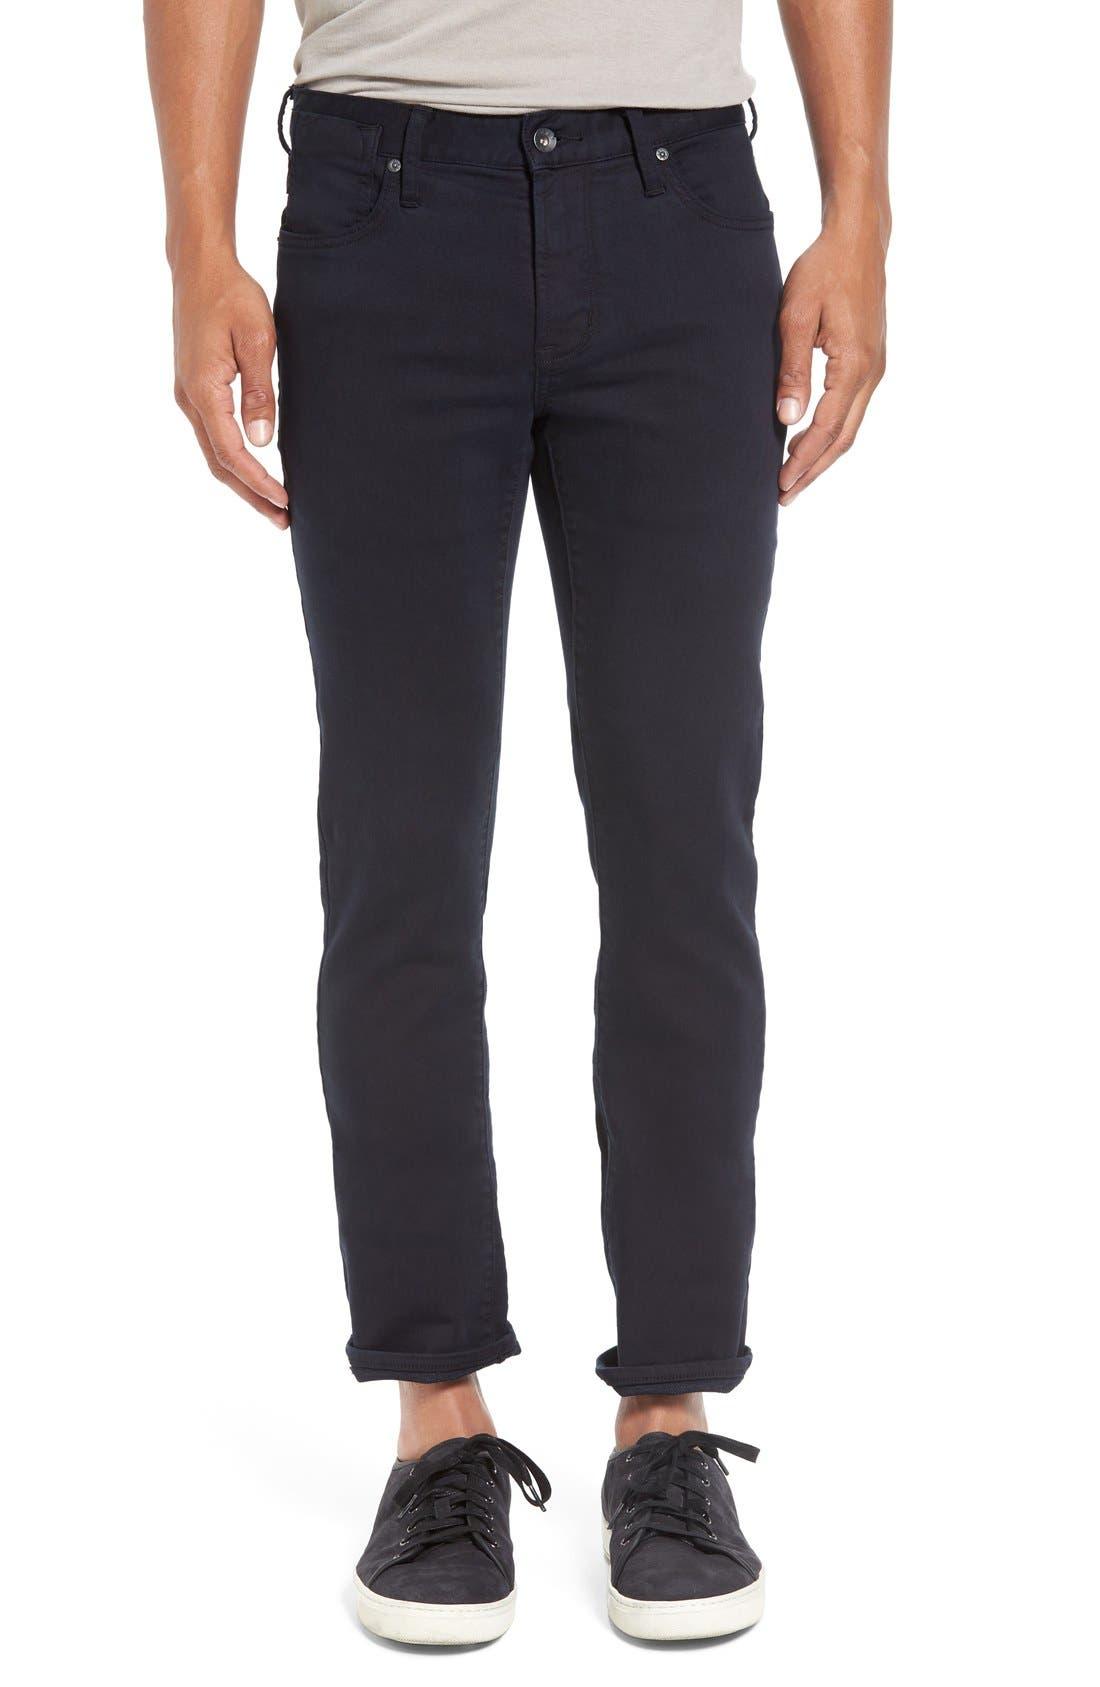 'Bowery' Slim Fit Pants,                             Main thumbnail 1, color,                             Eclipse